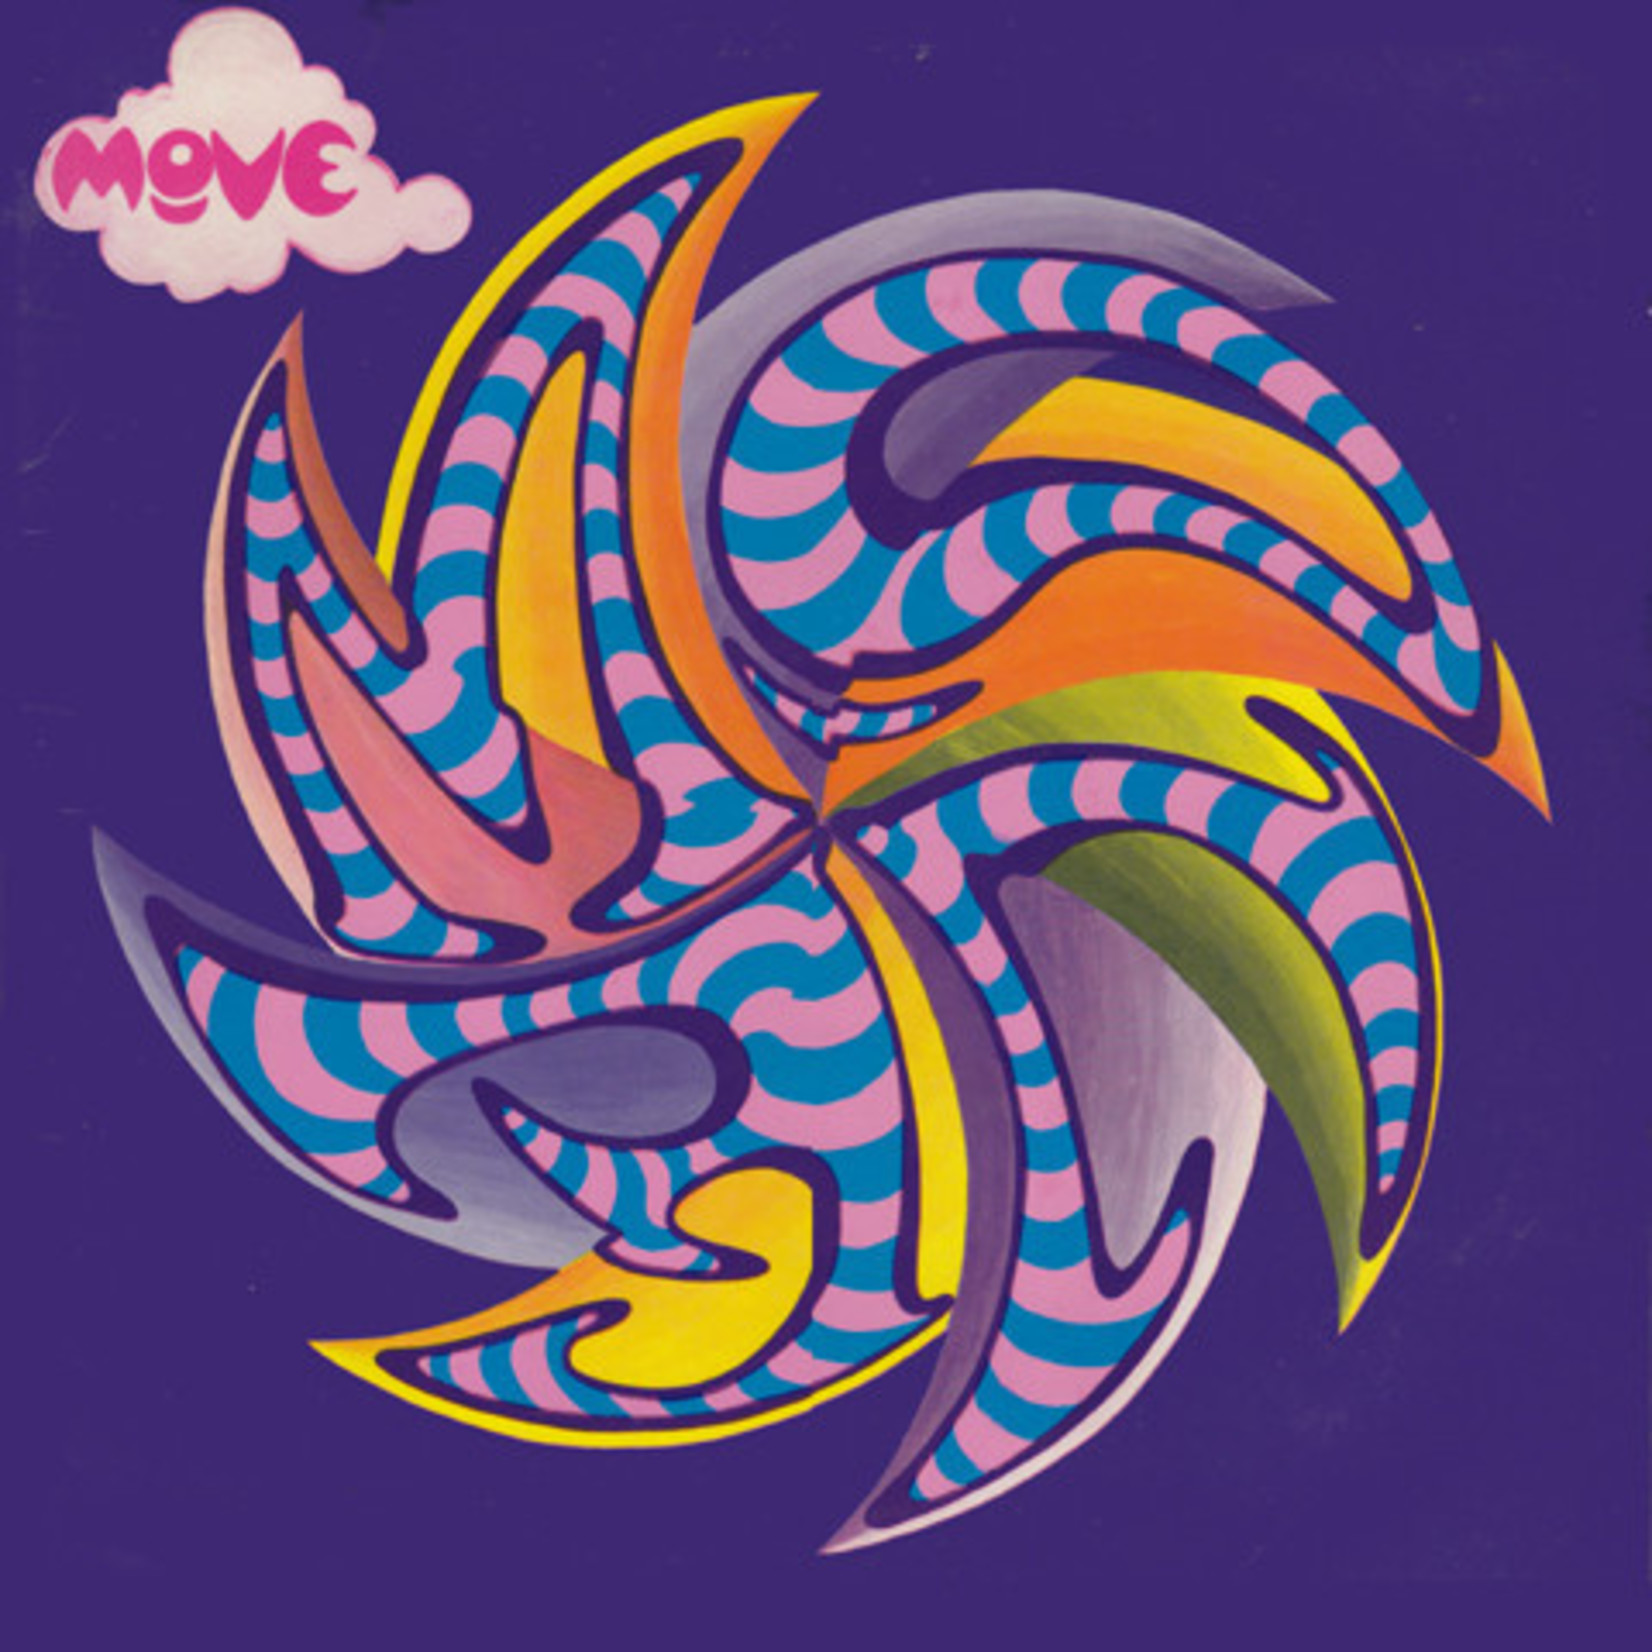 Vinyl The Move - S/T UK 1st Press